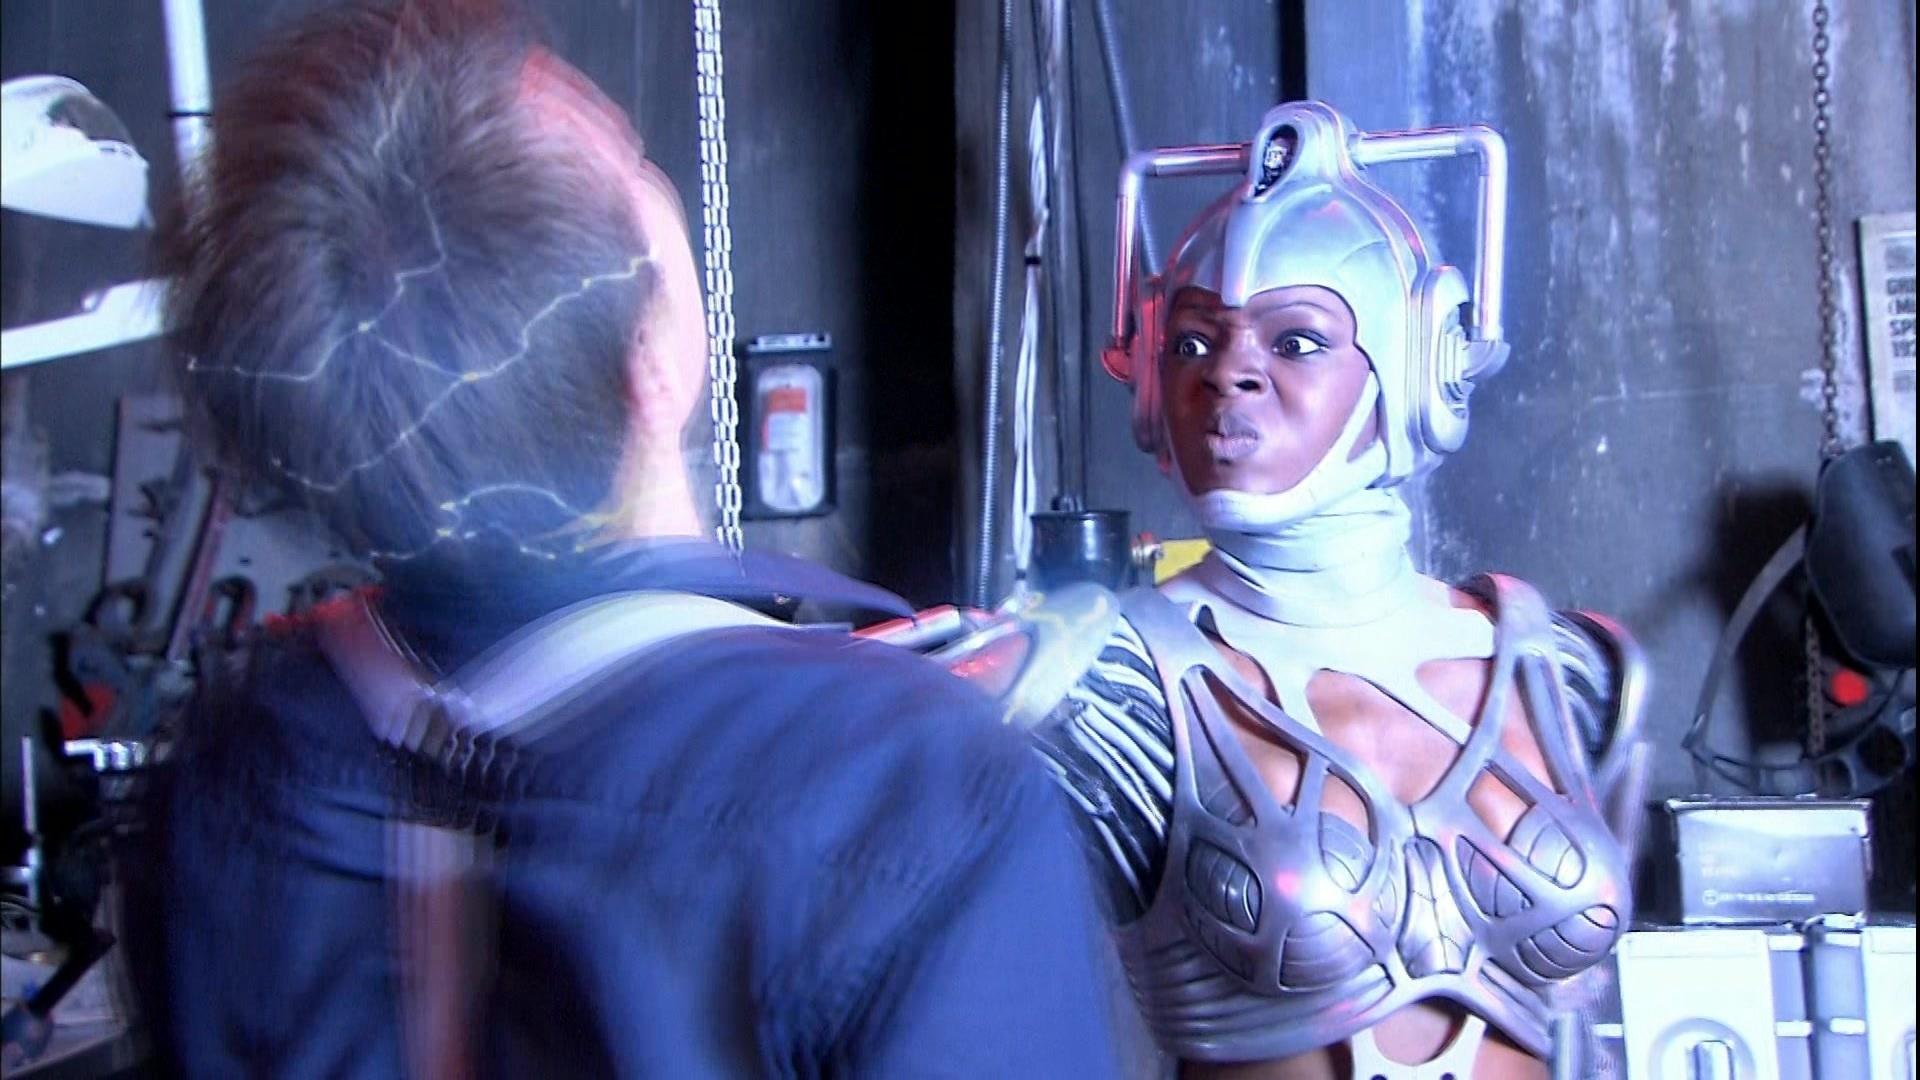 1x04-Cyberwoman-captain-jack-harkness-22964469-1920-1080